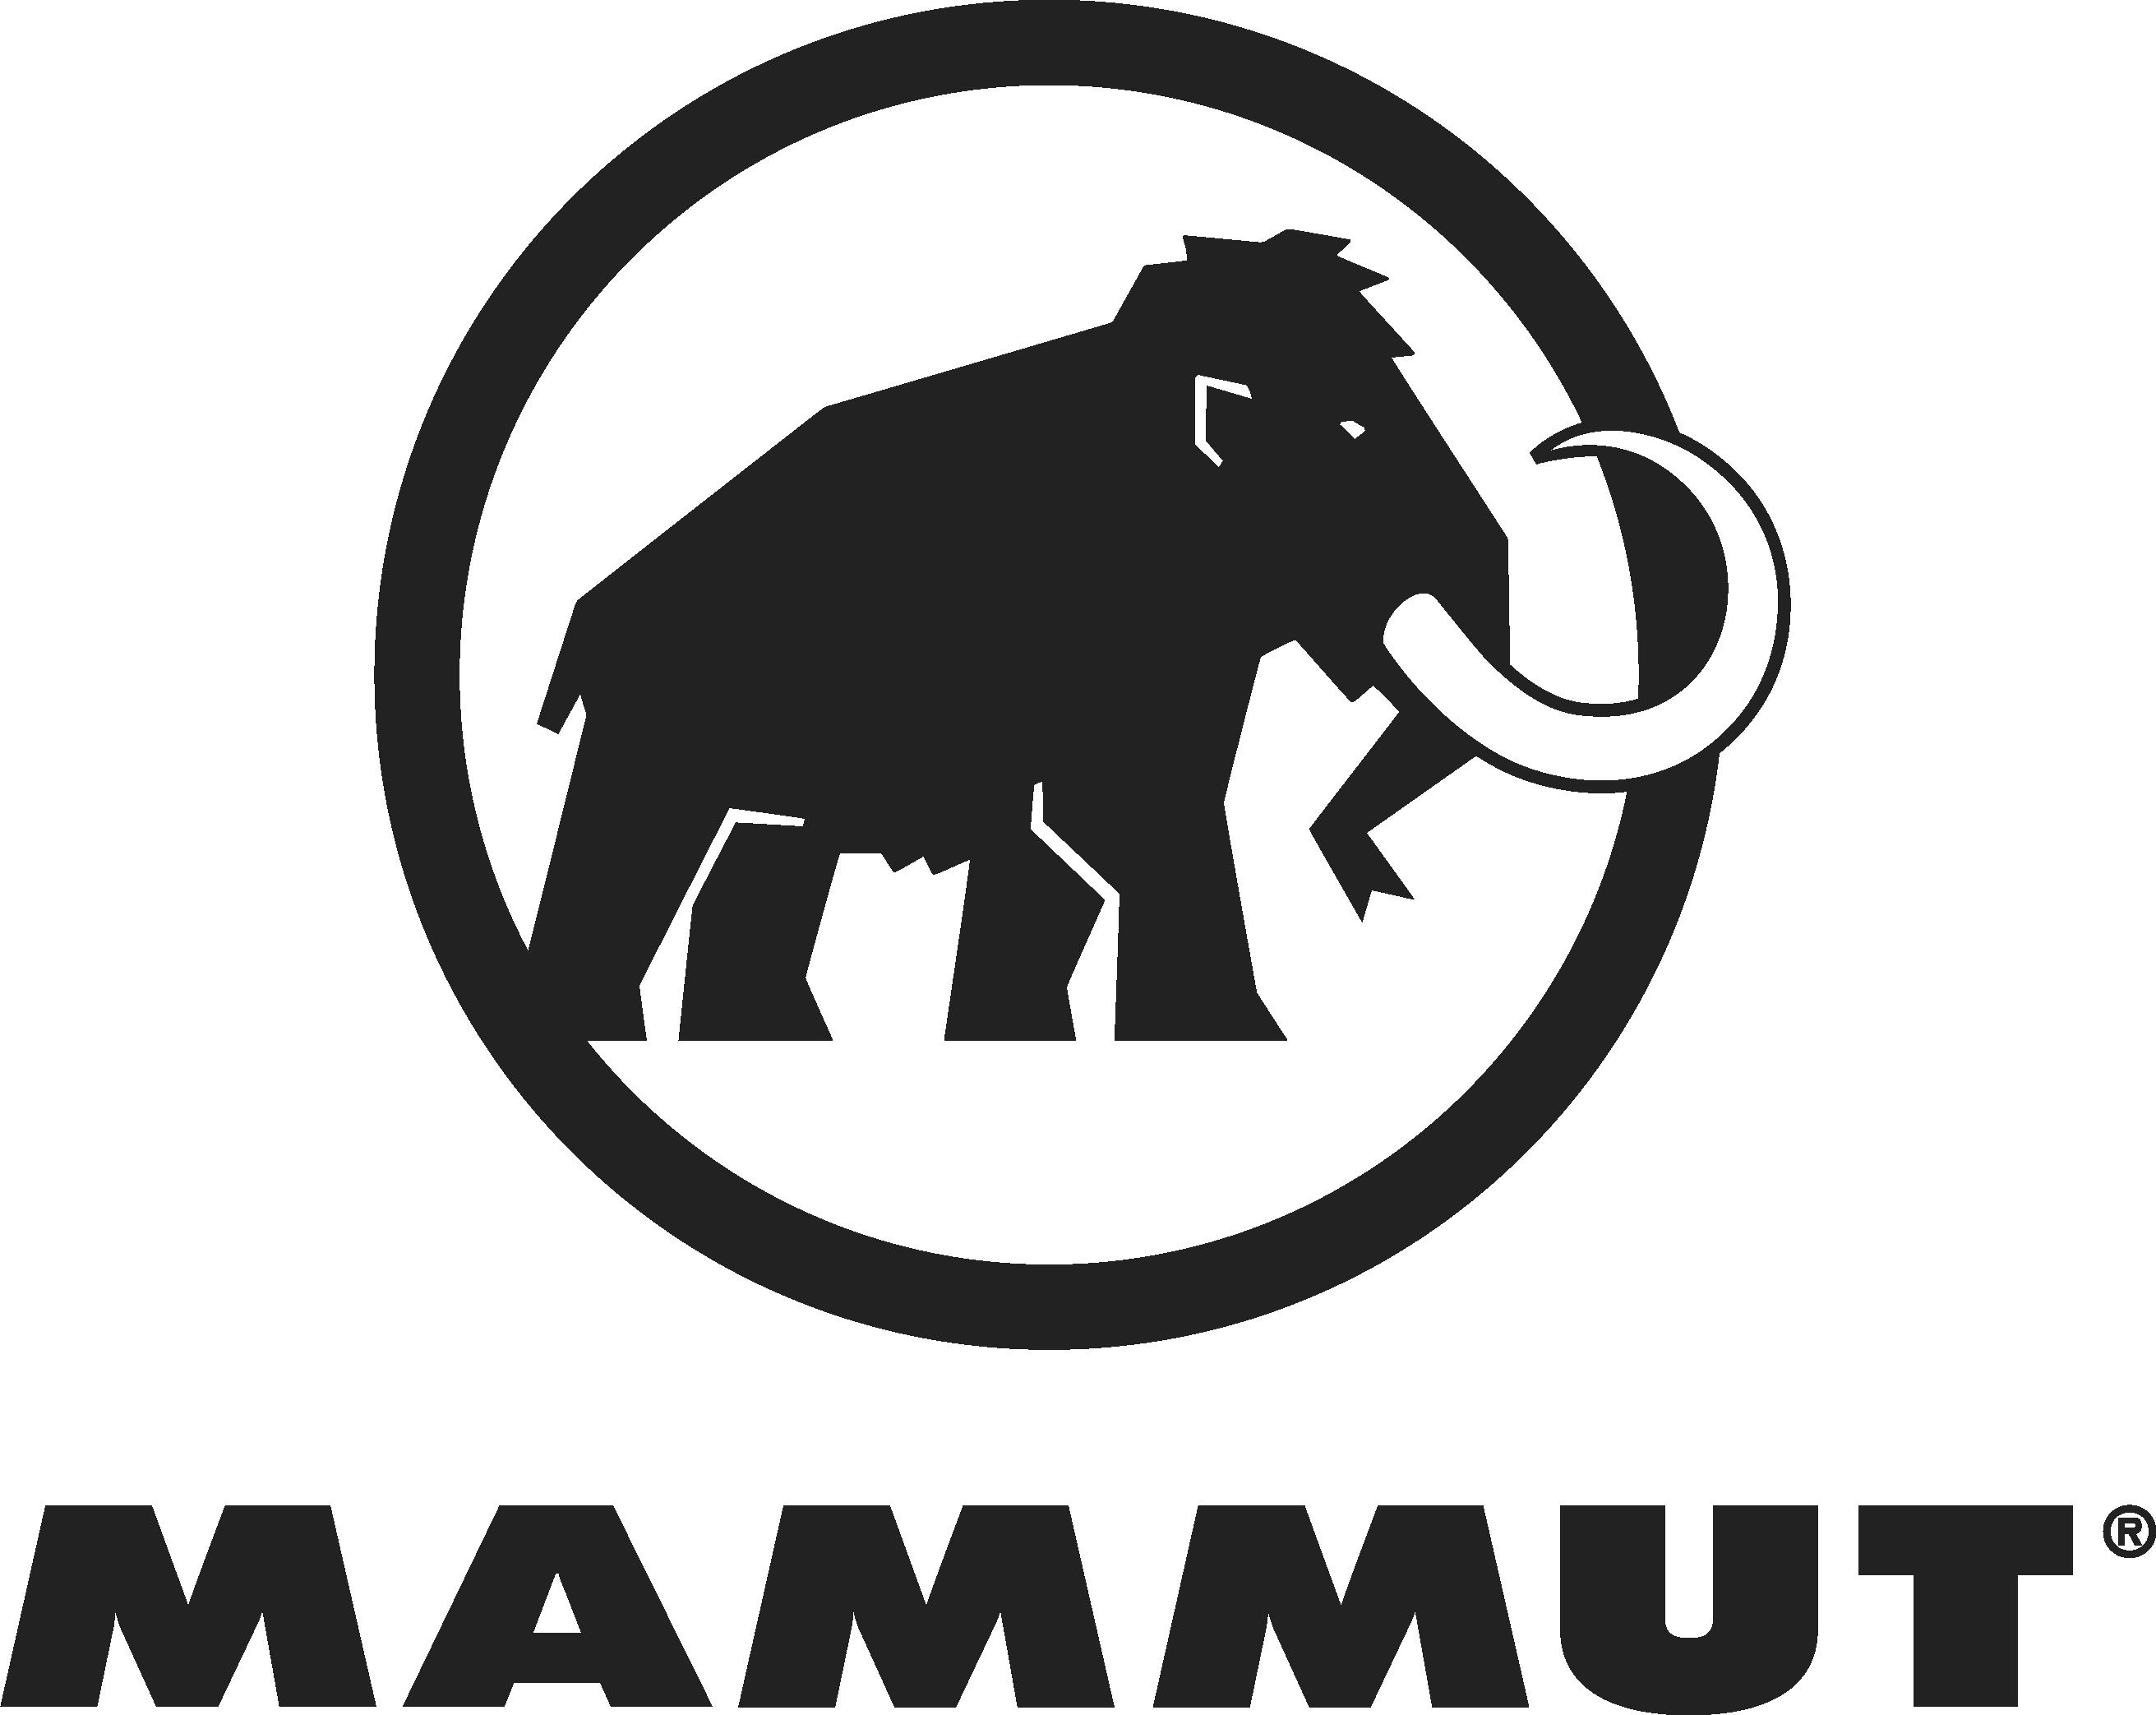 Mammut Airbags Logo